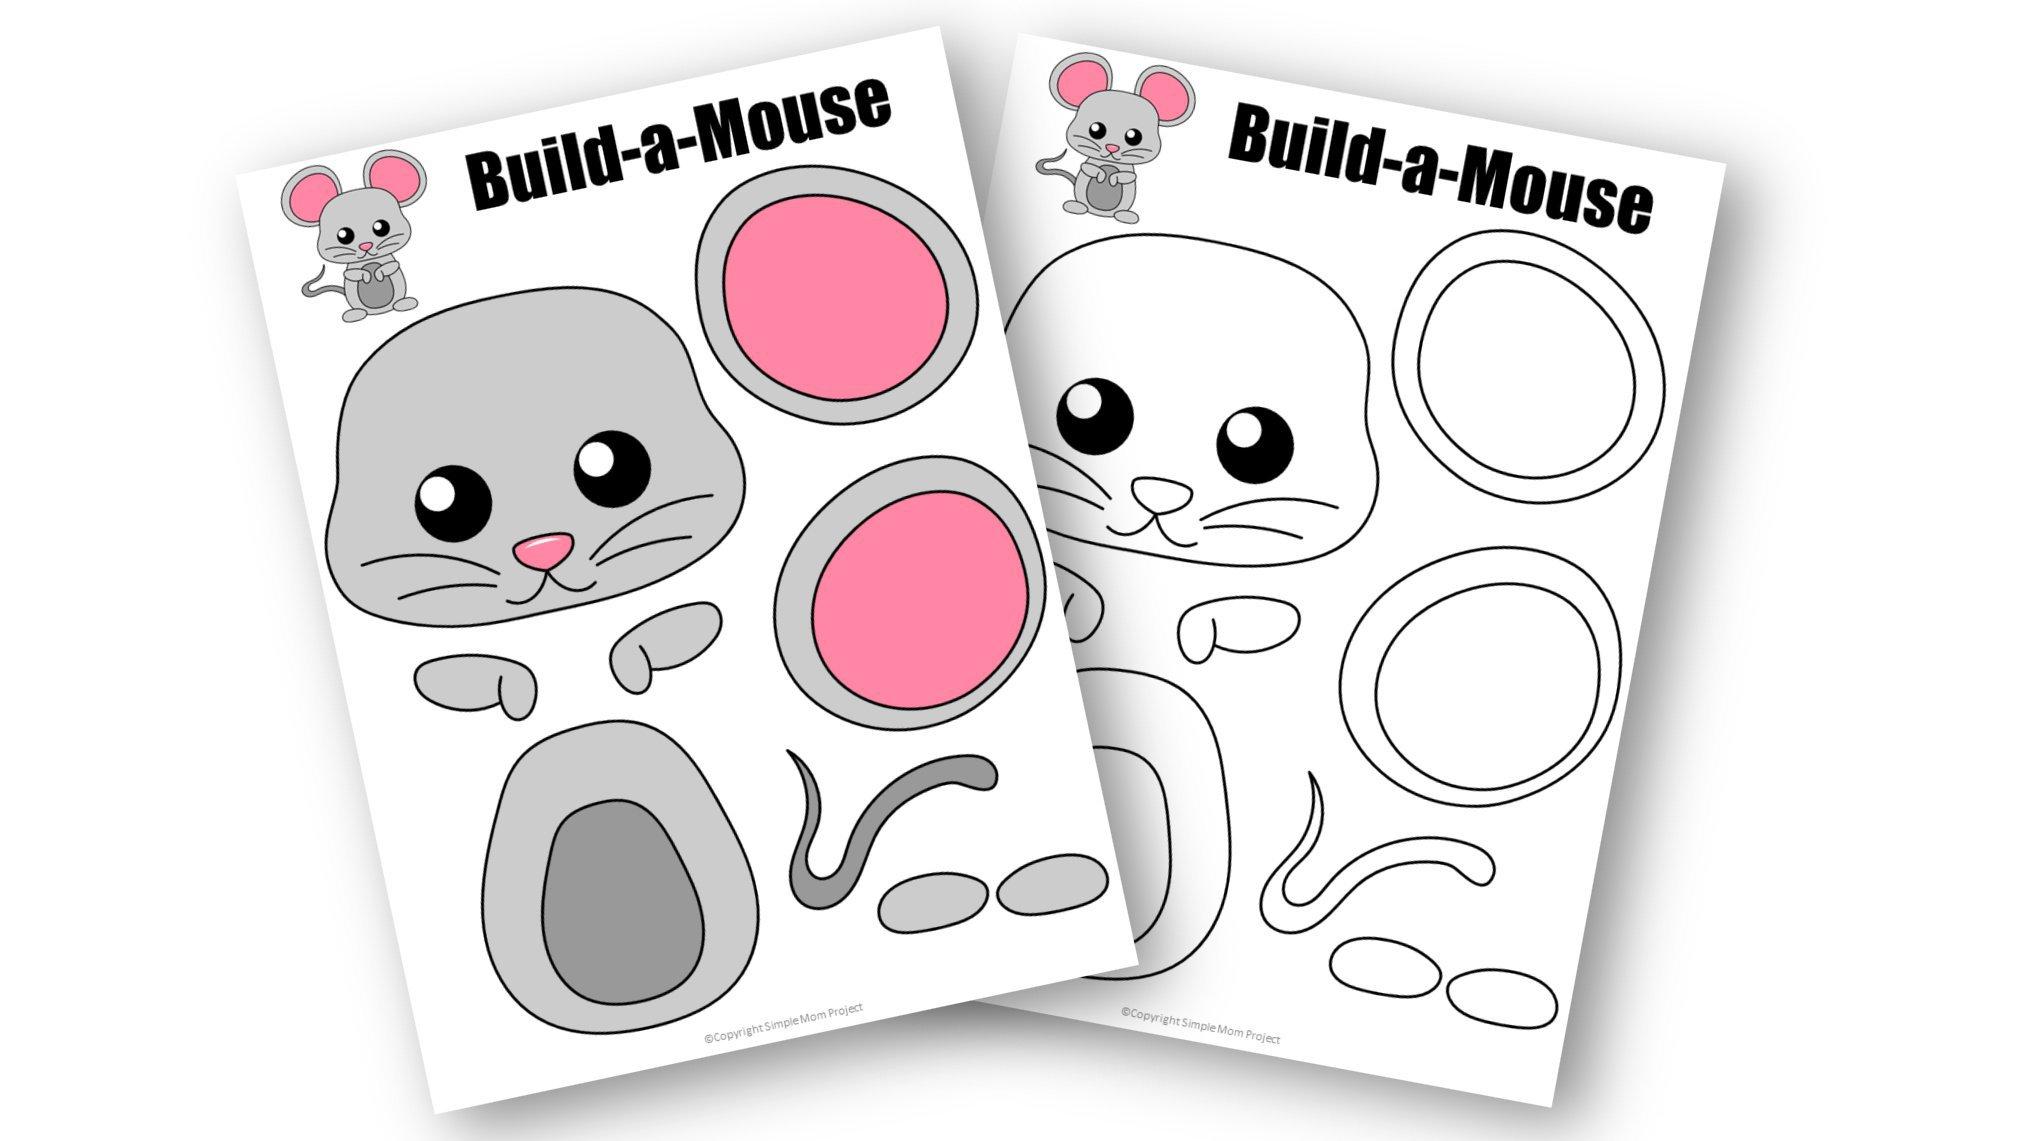 Free Printable Mouse Hedgehog Craft Template for kids, preschoolers, toddlers and kindergartners